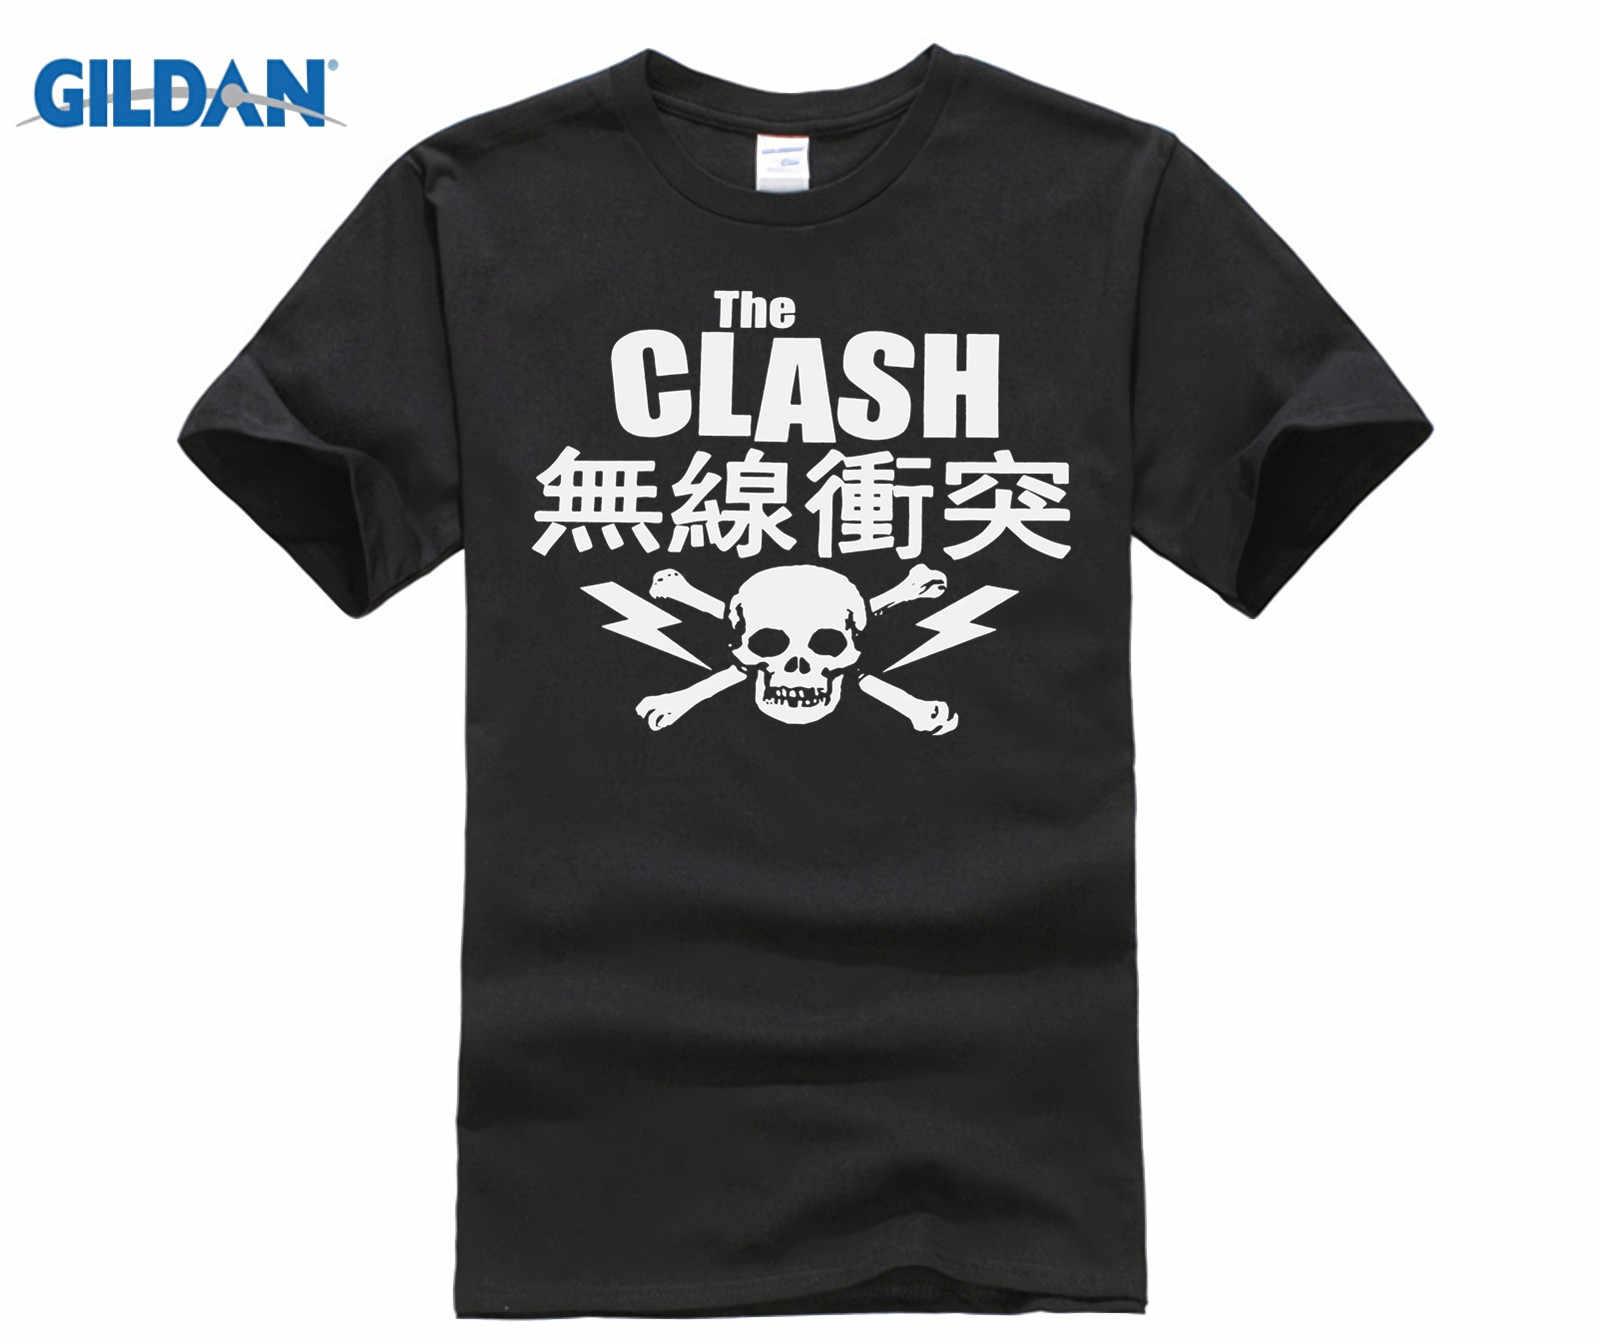 7120c908 casual t-shirt Fashion Men And Woman T Shirt Free Shipping The Clash  Japanese Skull